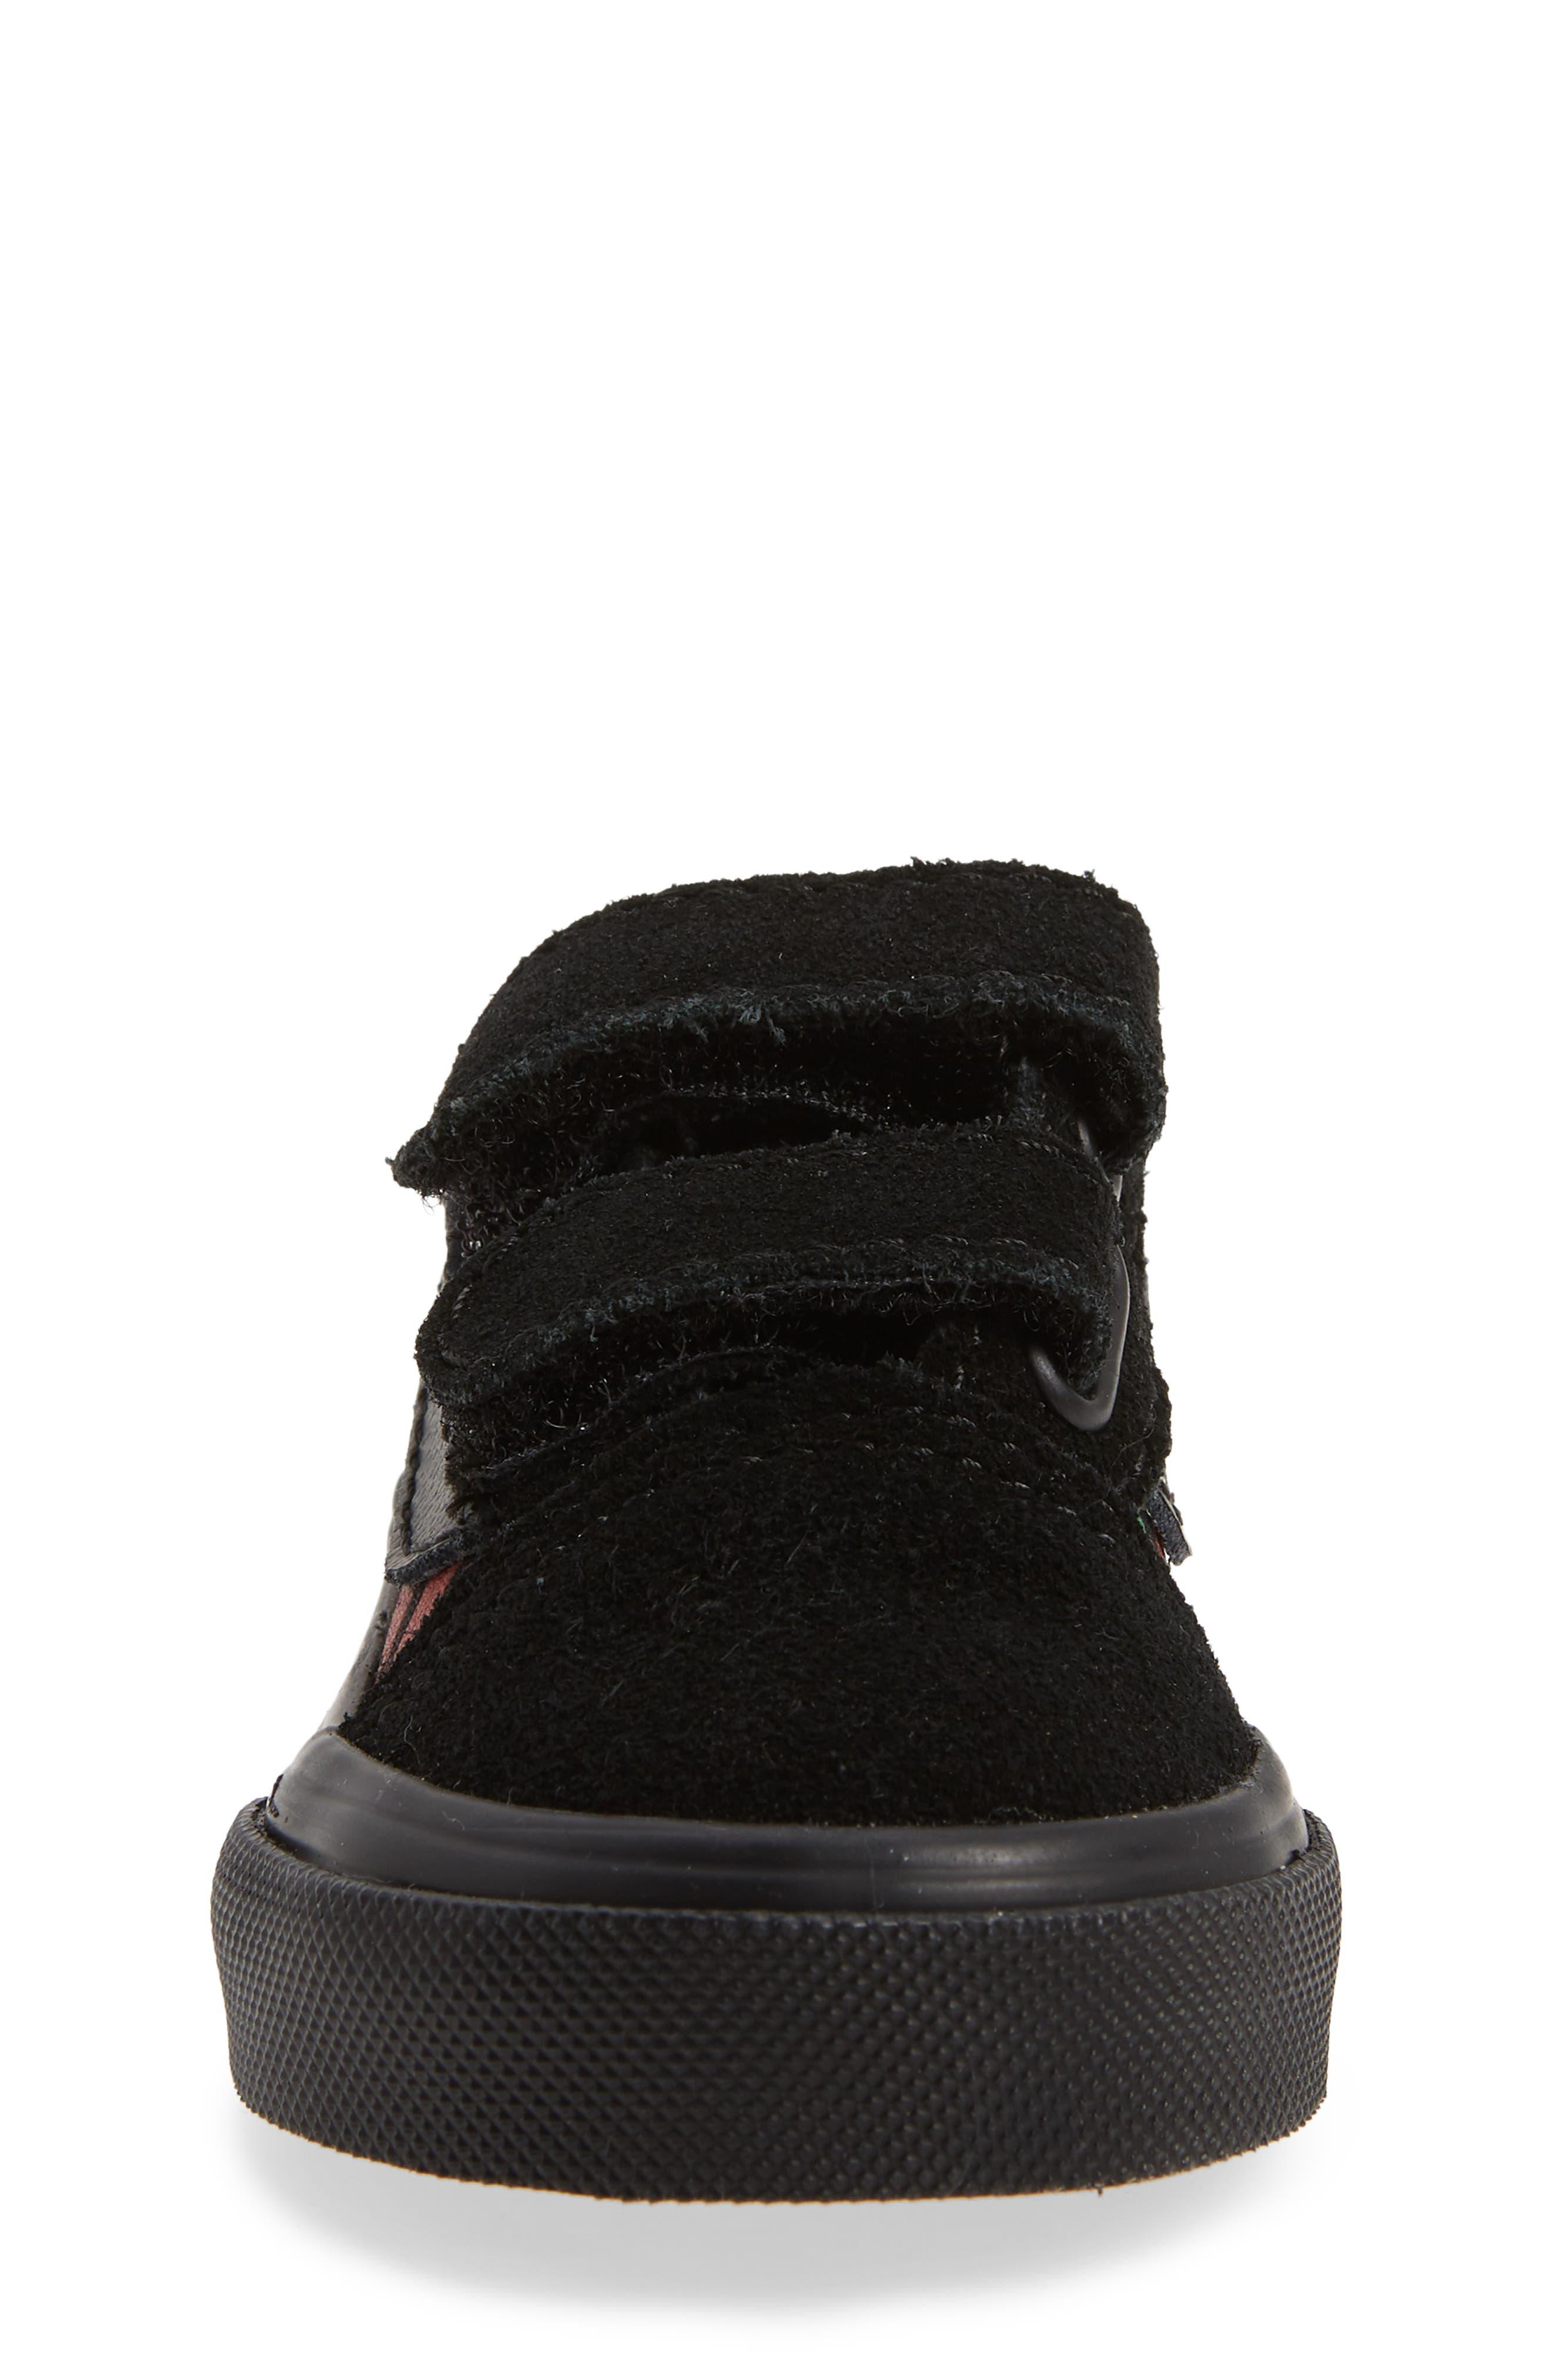 Old Skool V Sneaker,                             Alternate thumbnail 4, color,                             Black